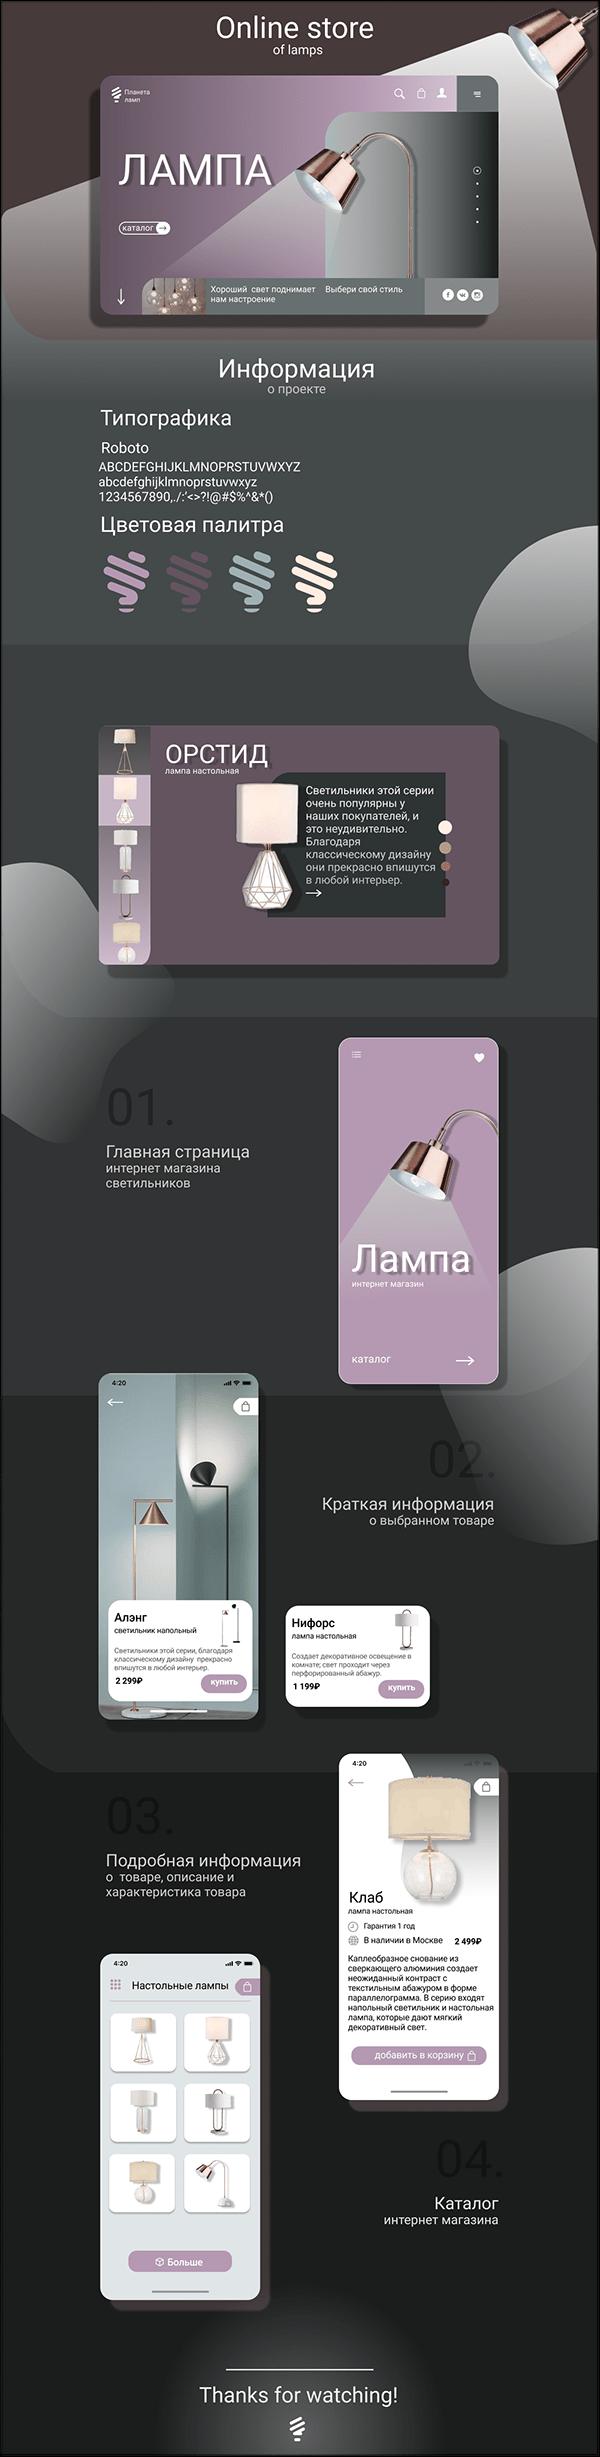 Online store of lamps   App Design   Web Design